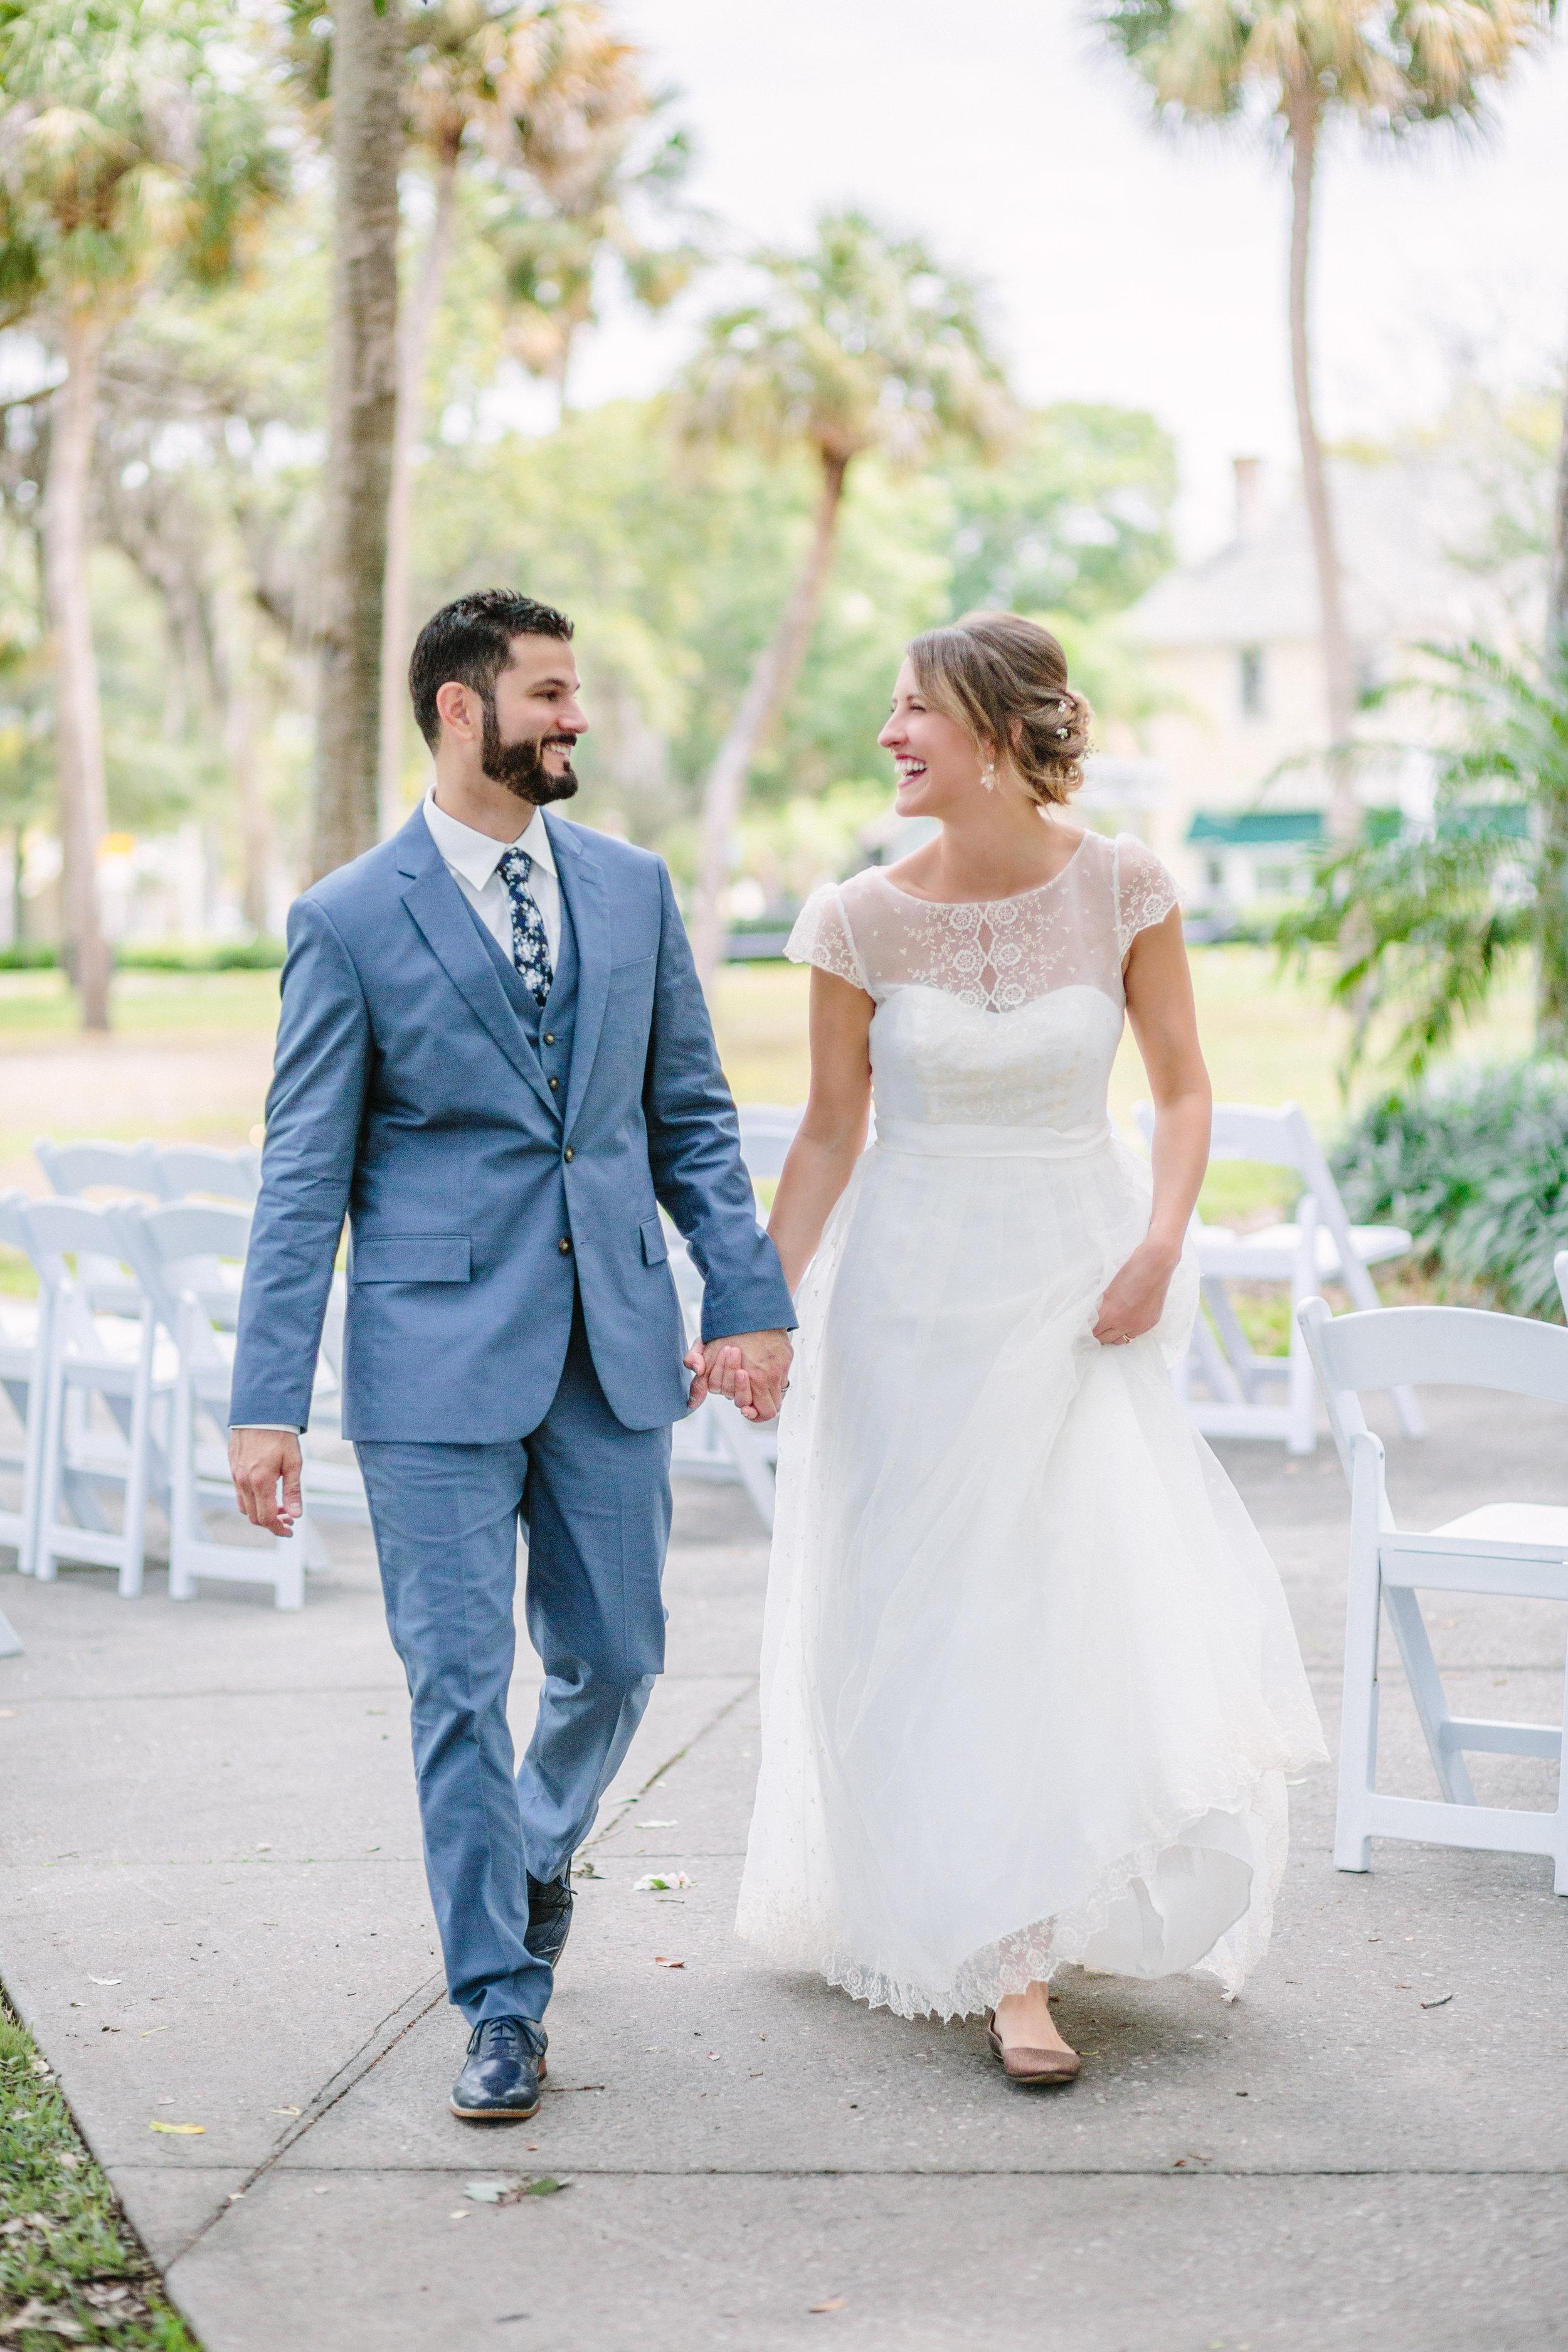 Outdoor wedding ceremony in clearwater Florida